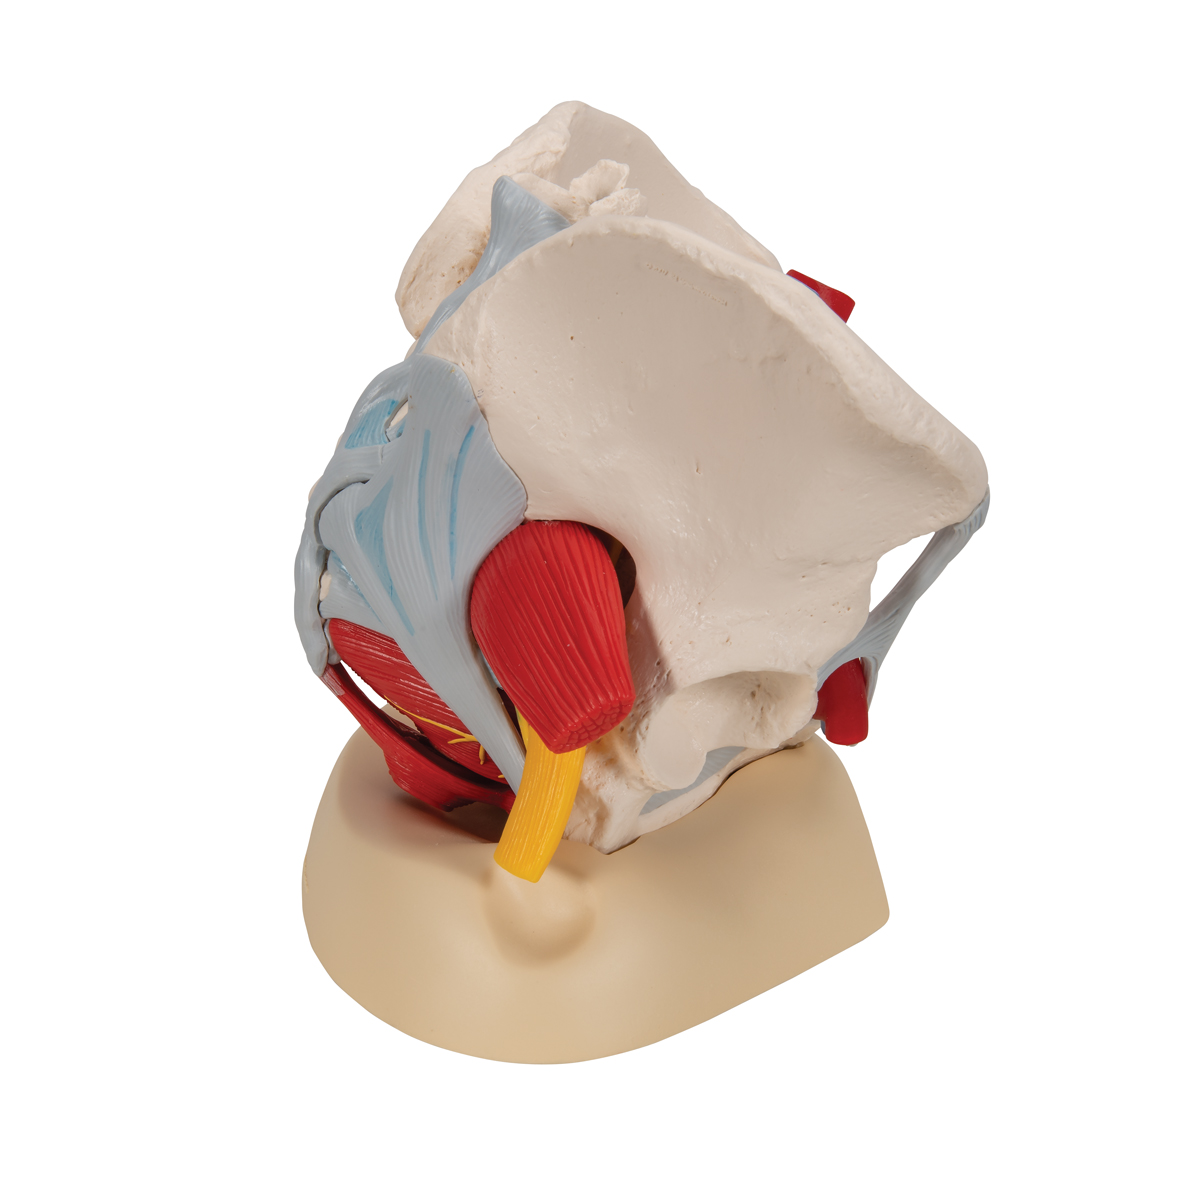 Anatomical Teaching Models | Plastic Human Pelvic Models | Female ...